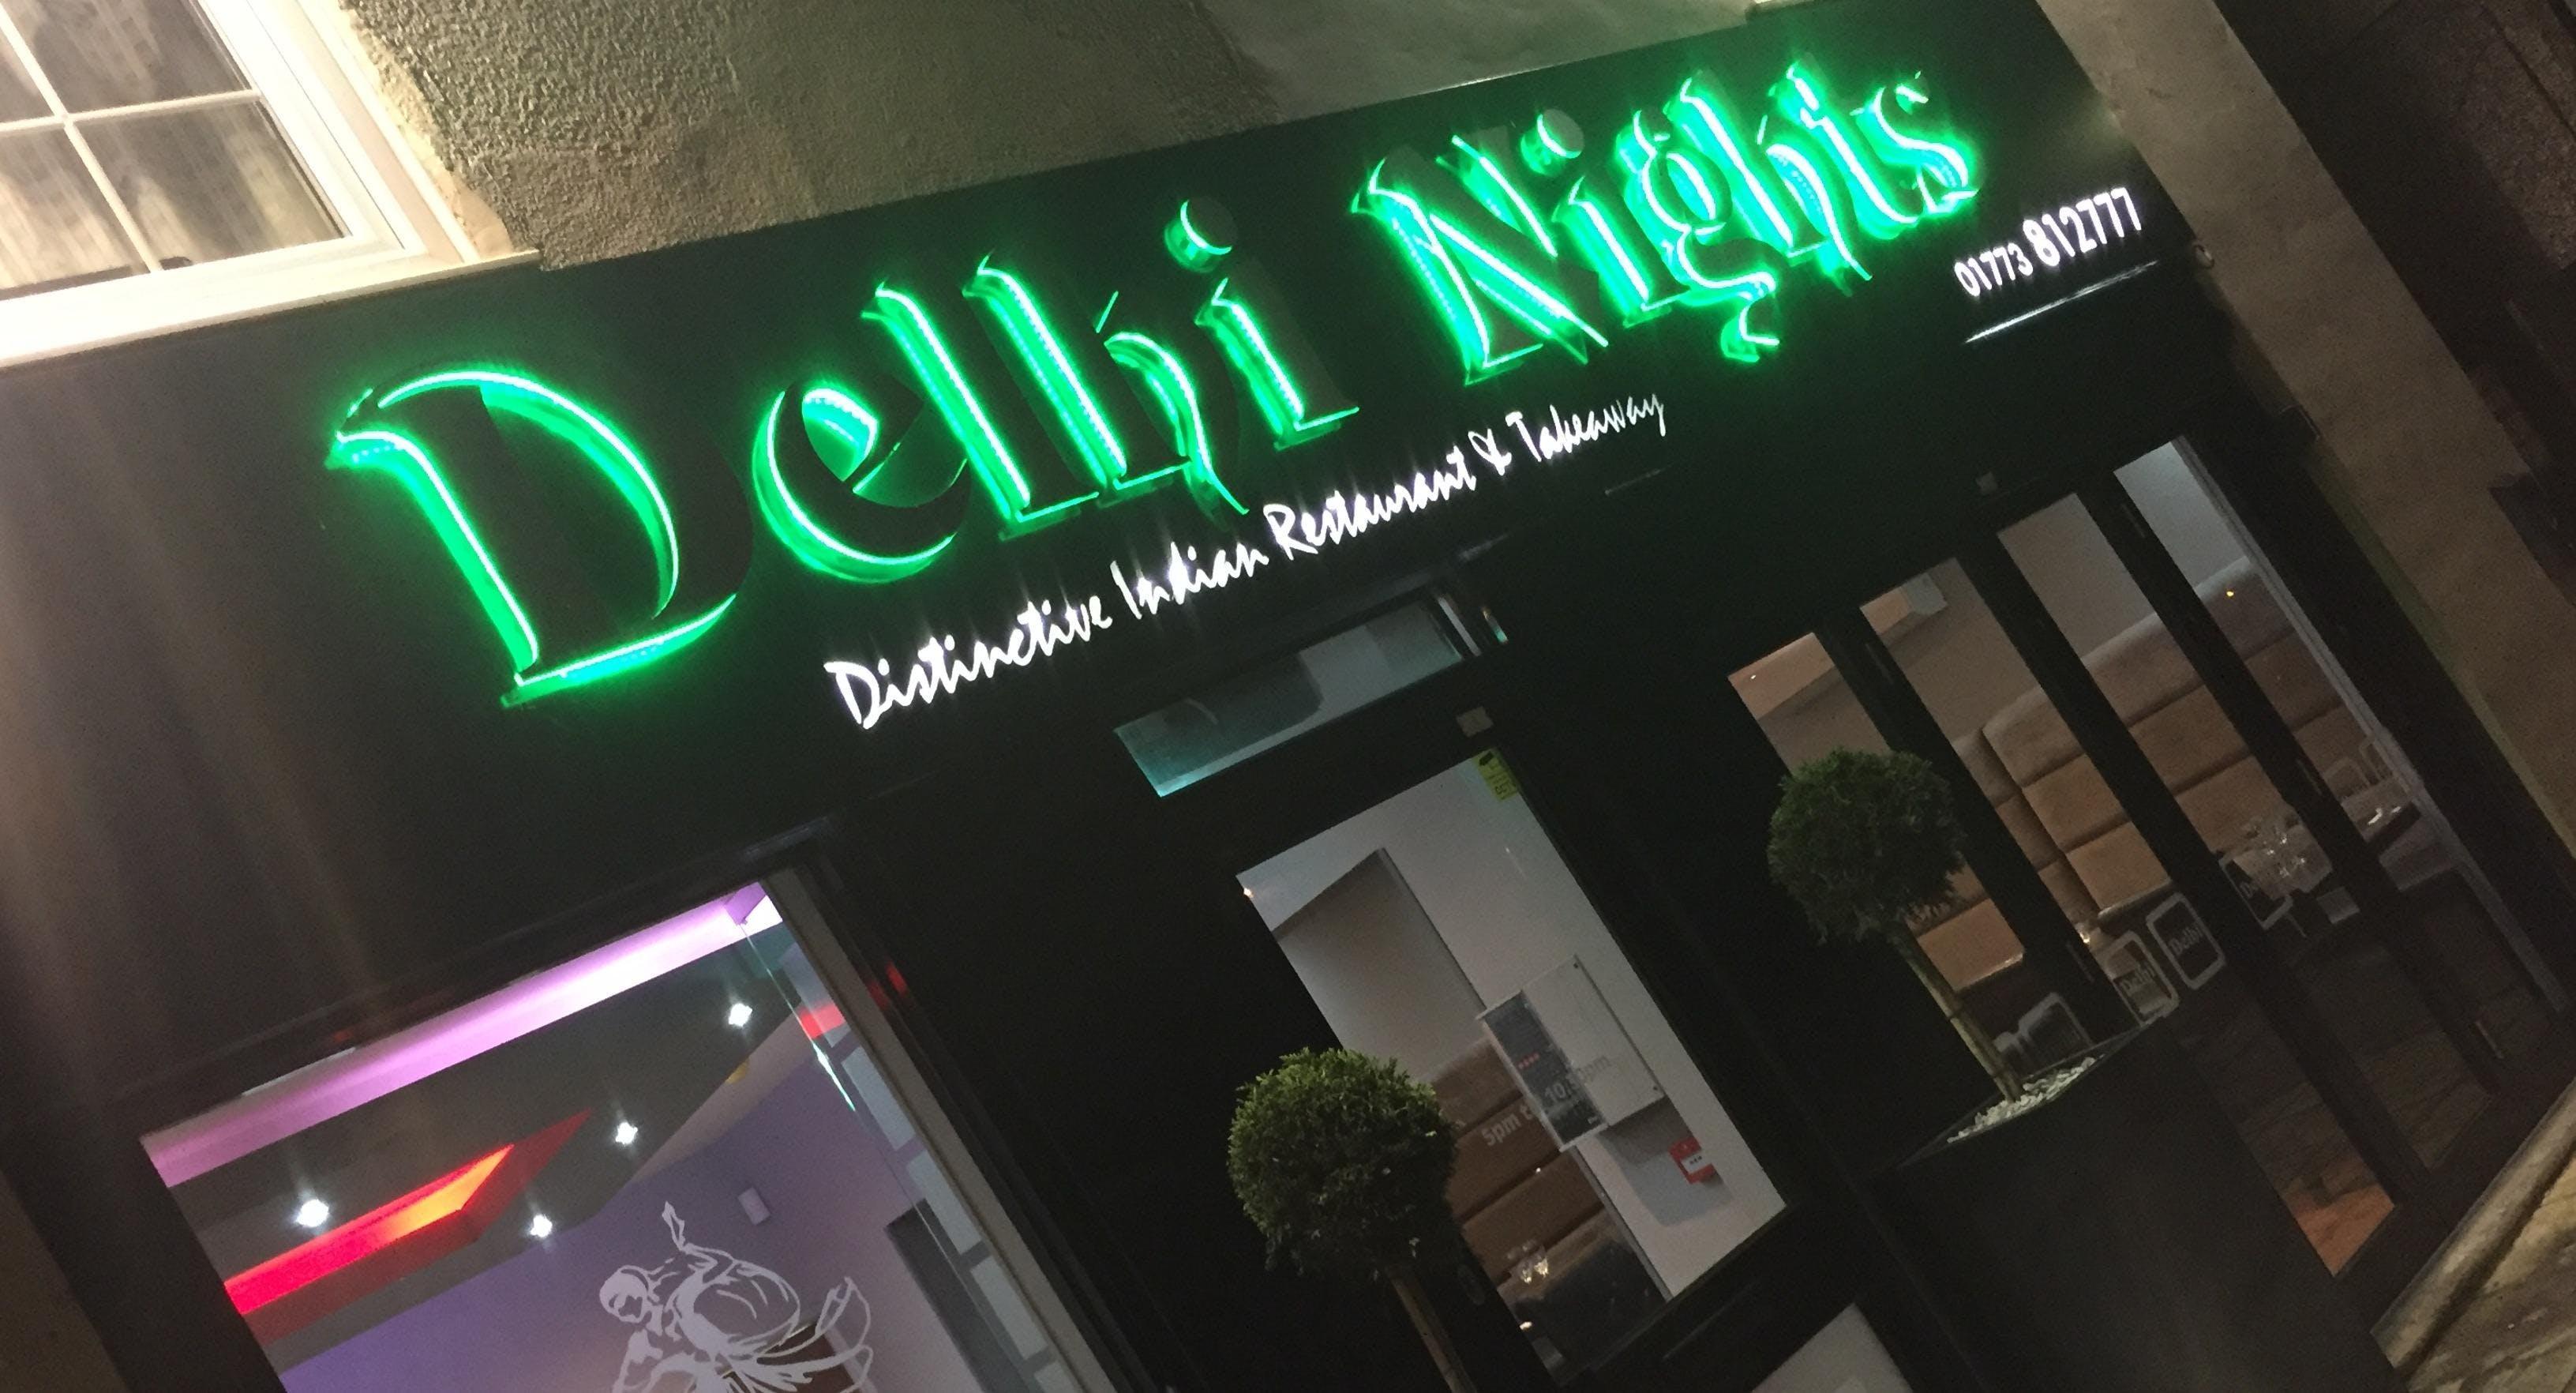 Delhi Nights Indian Restaurant Alfreton image 2